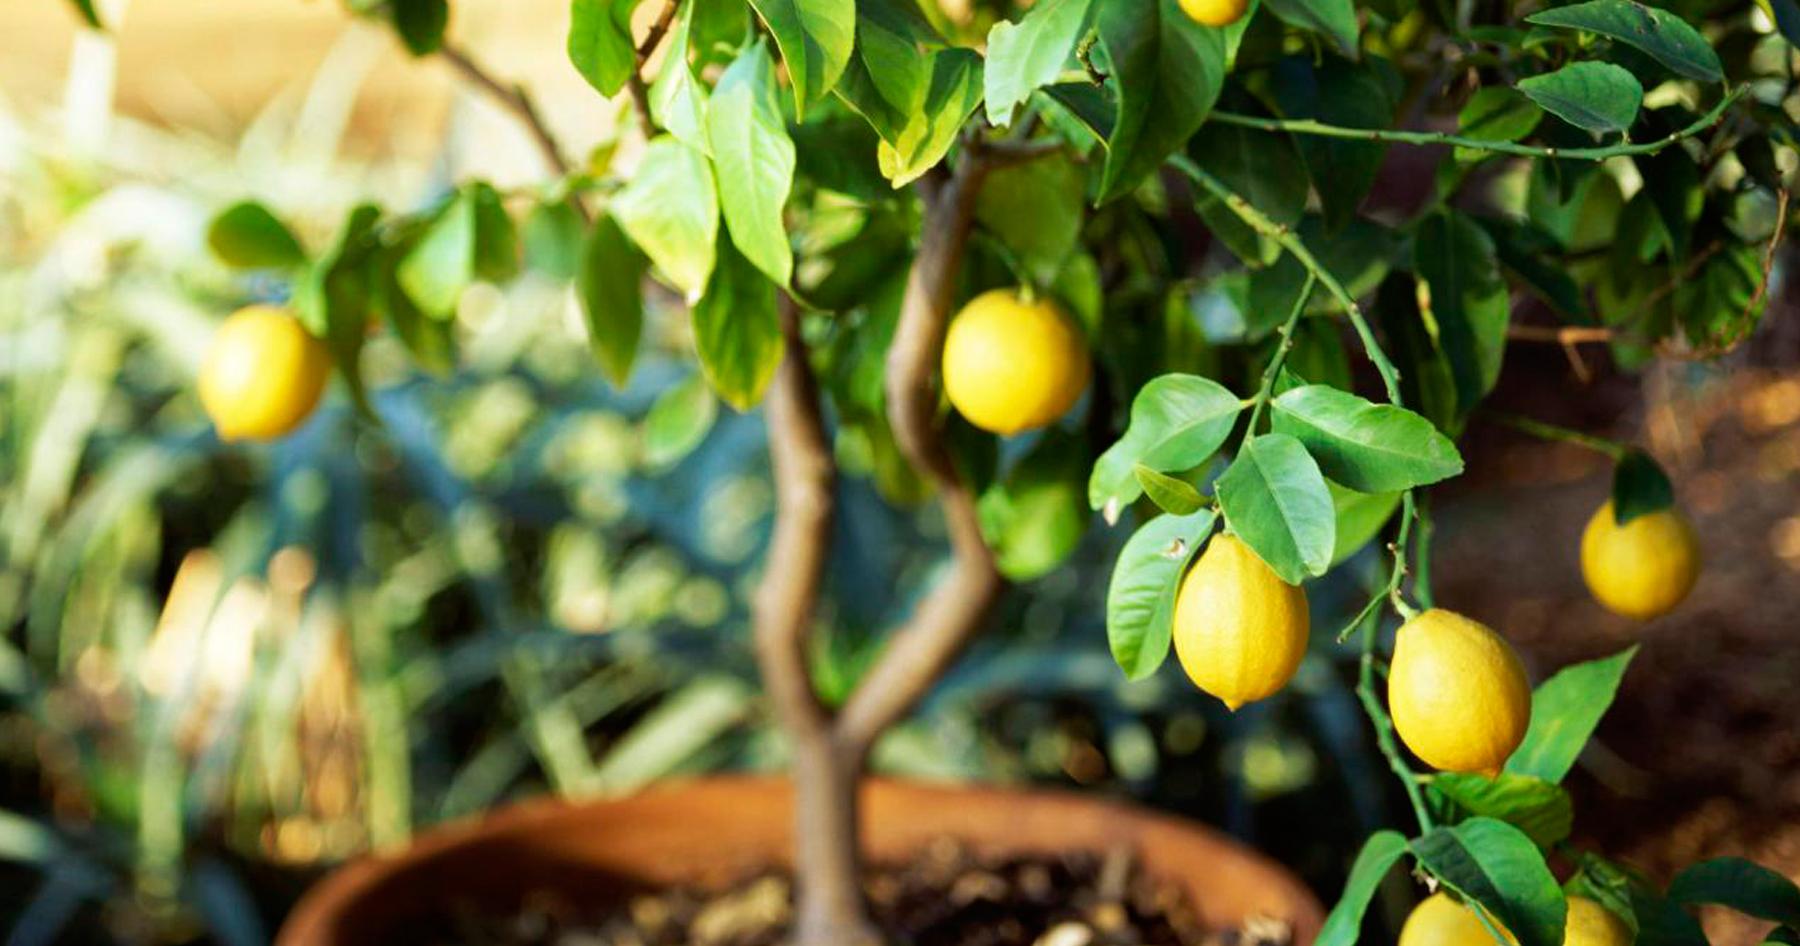 pianta-limoni-vintage-vaso-composizione